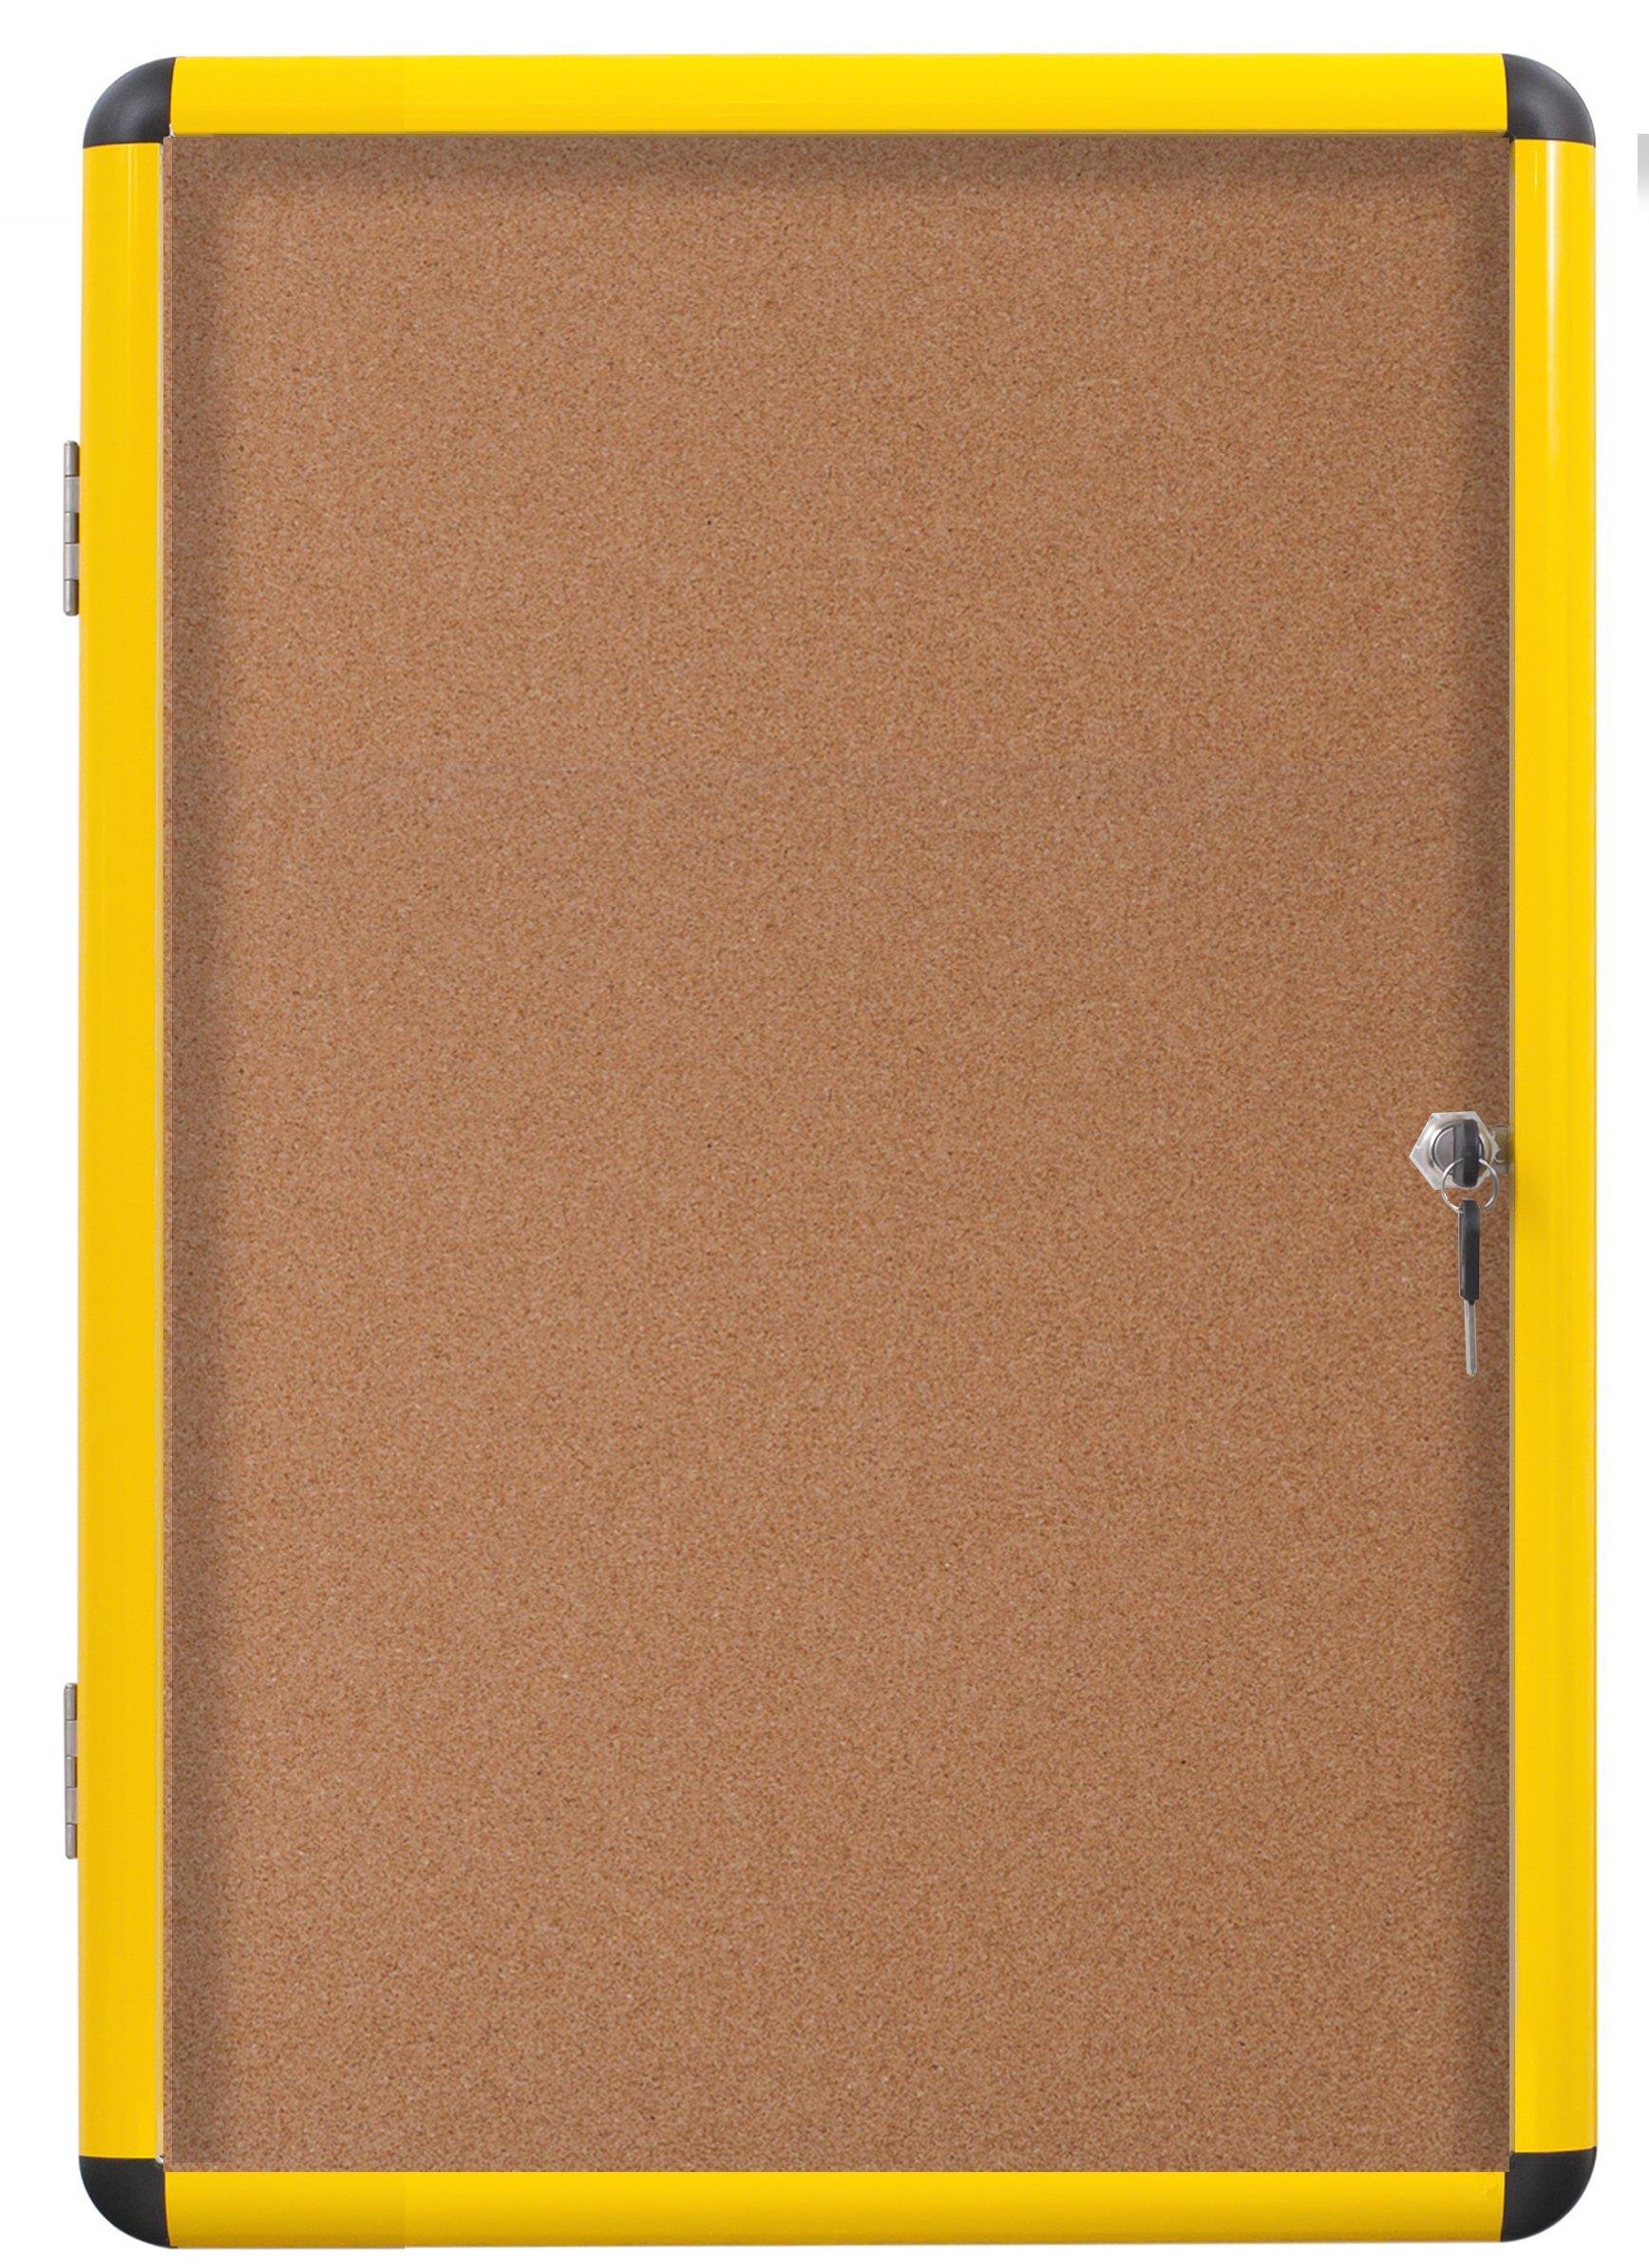 MasterVision Industrial Enclosed Cork Board, Single Door, Yellow Aluminum Frame, 28'' x 38.25'' (VT6301611511)